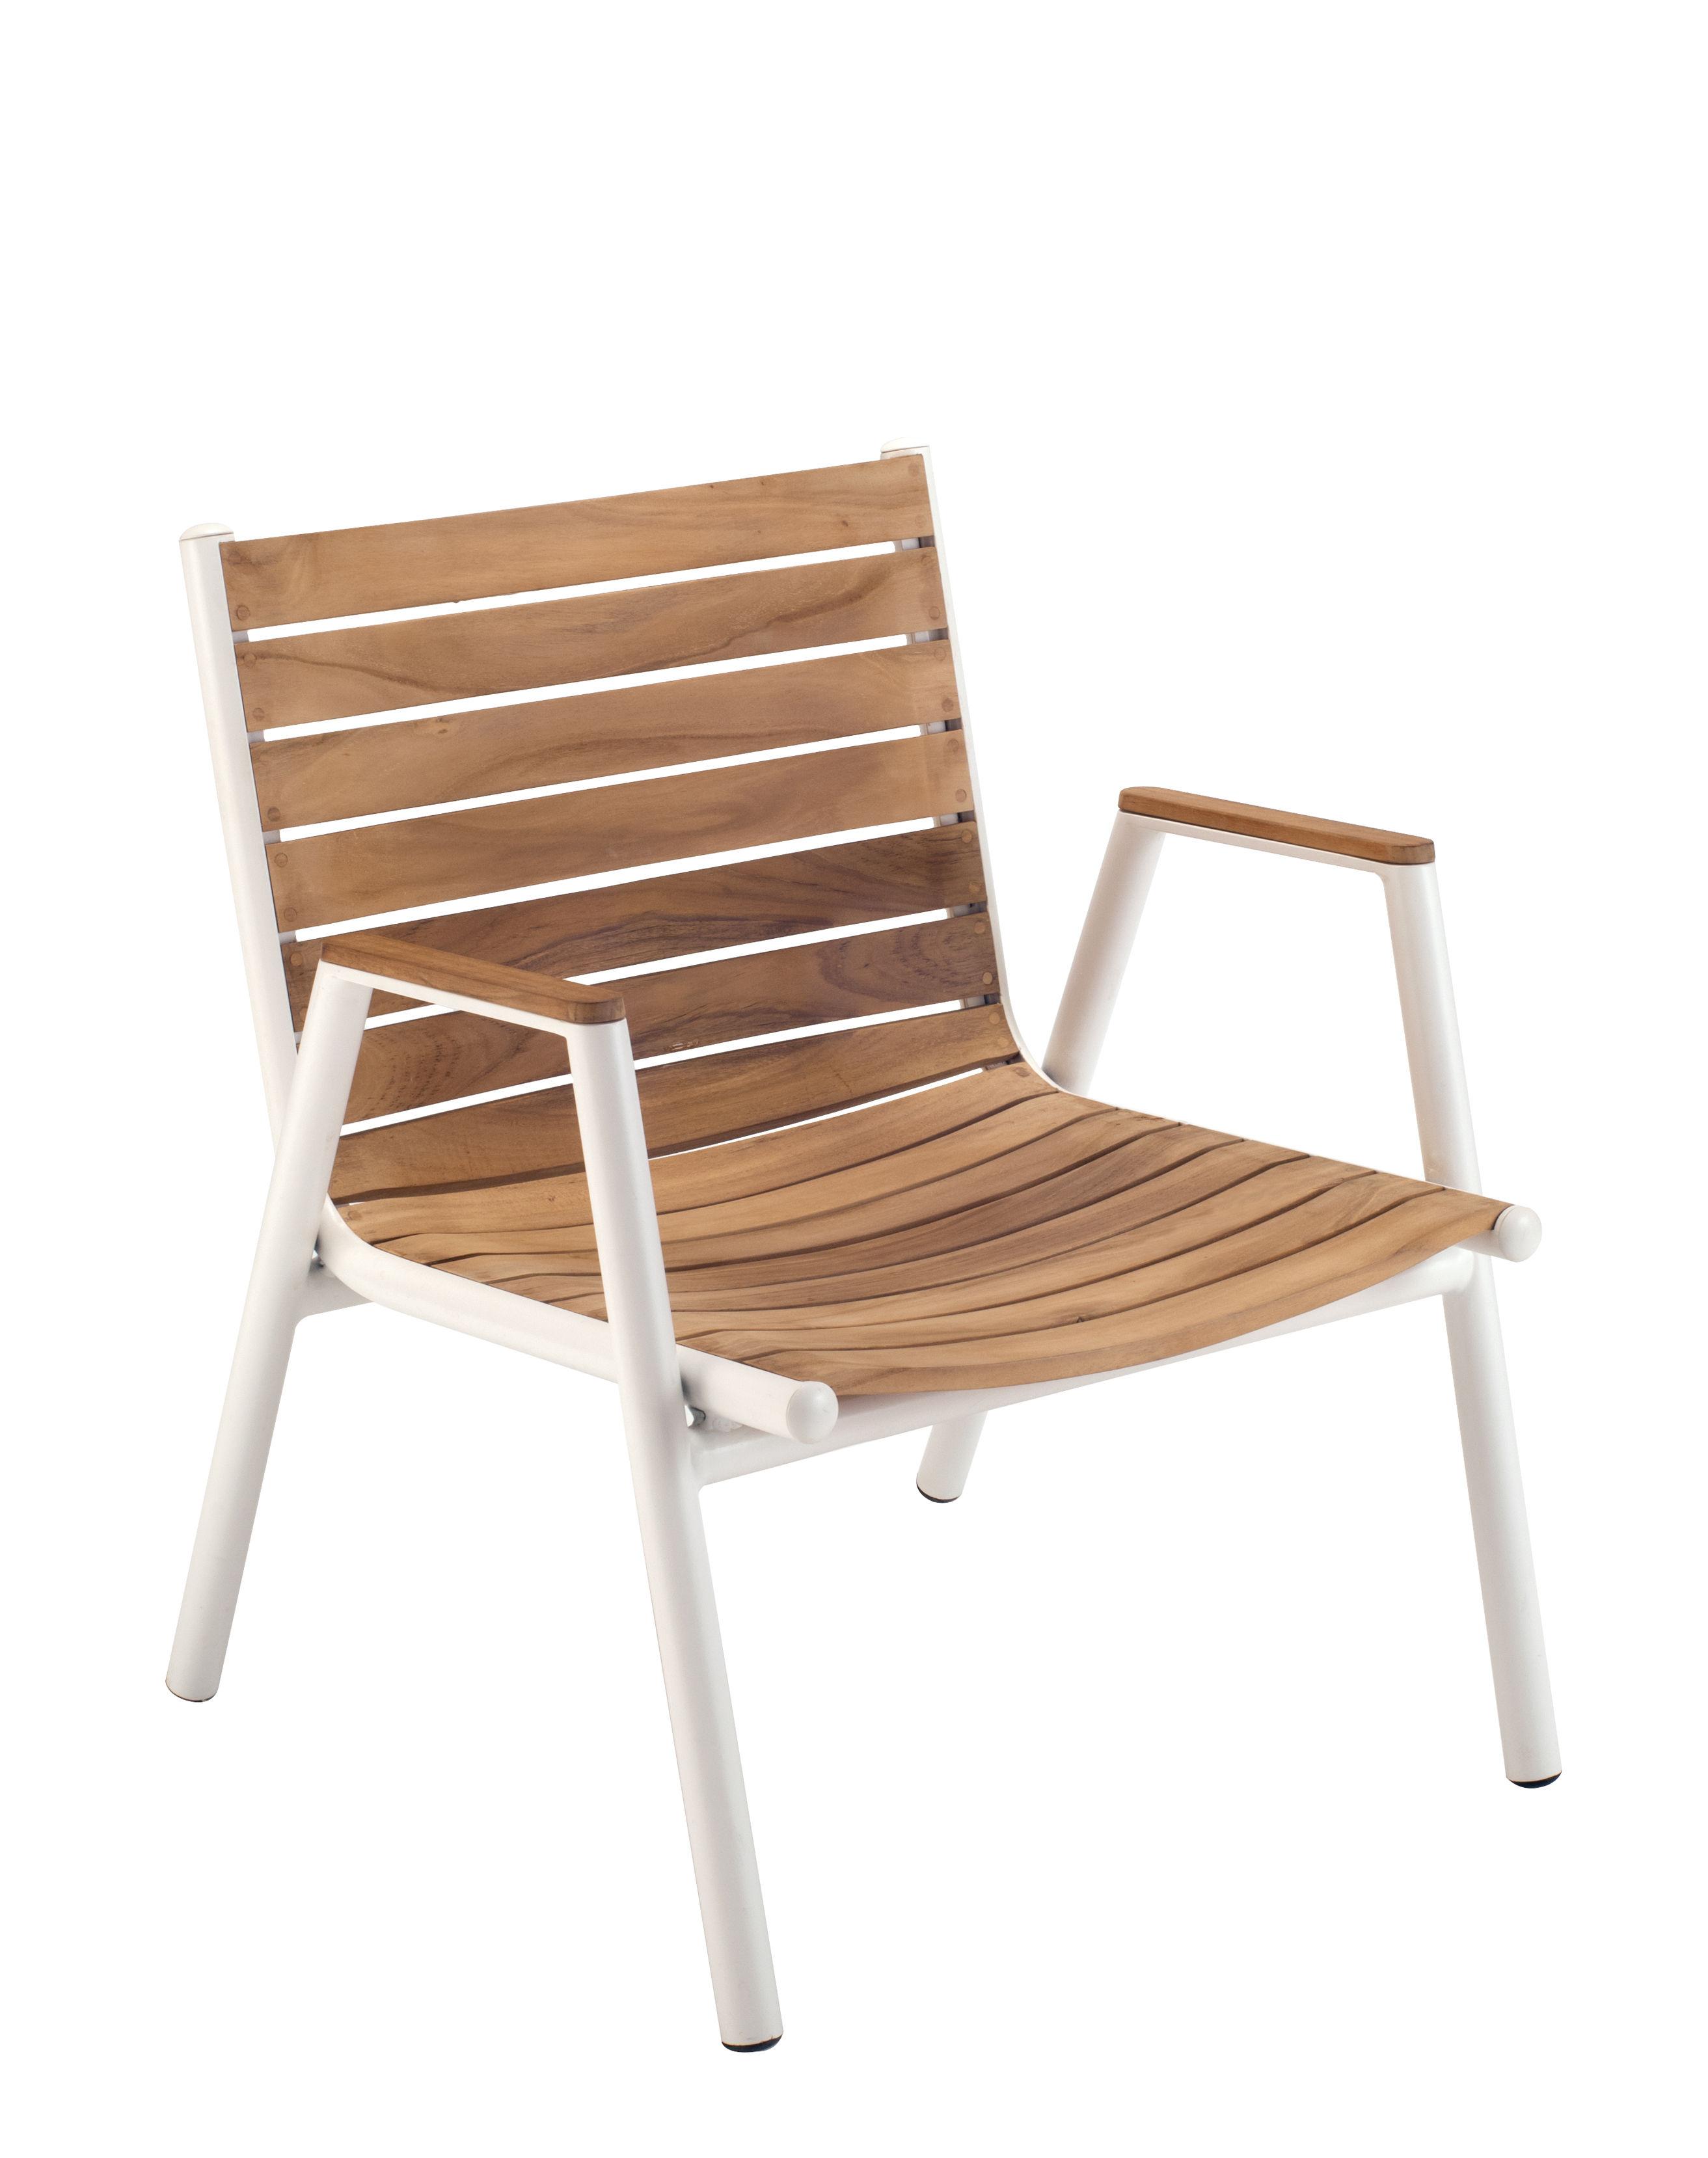 Furniture - Armchairs - Pilotis Low armchair - Stackable - Teak by Vlaemynck - Teak / White - Lacquered aluminium, Oiled teak